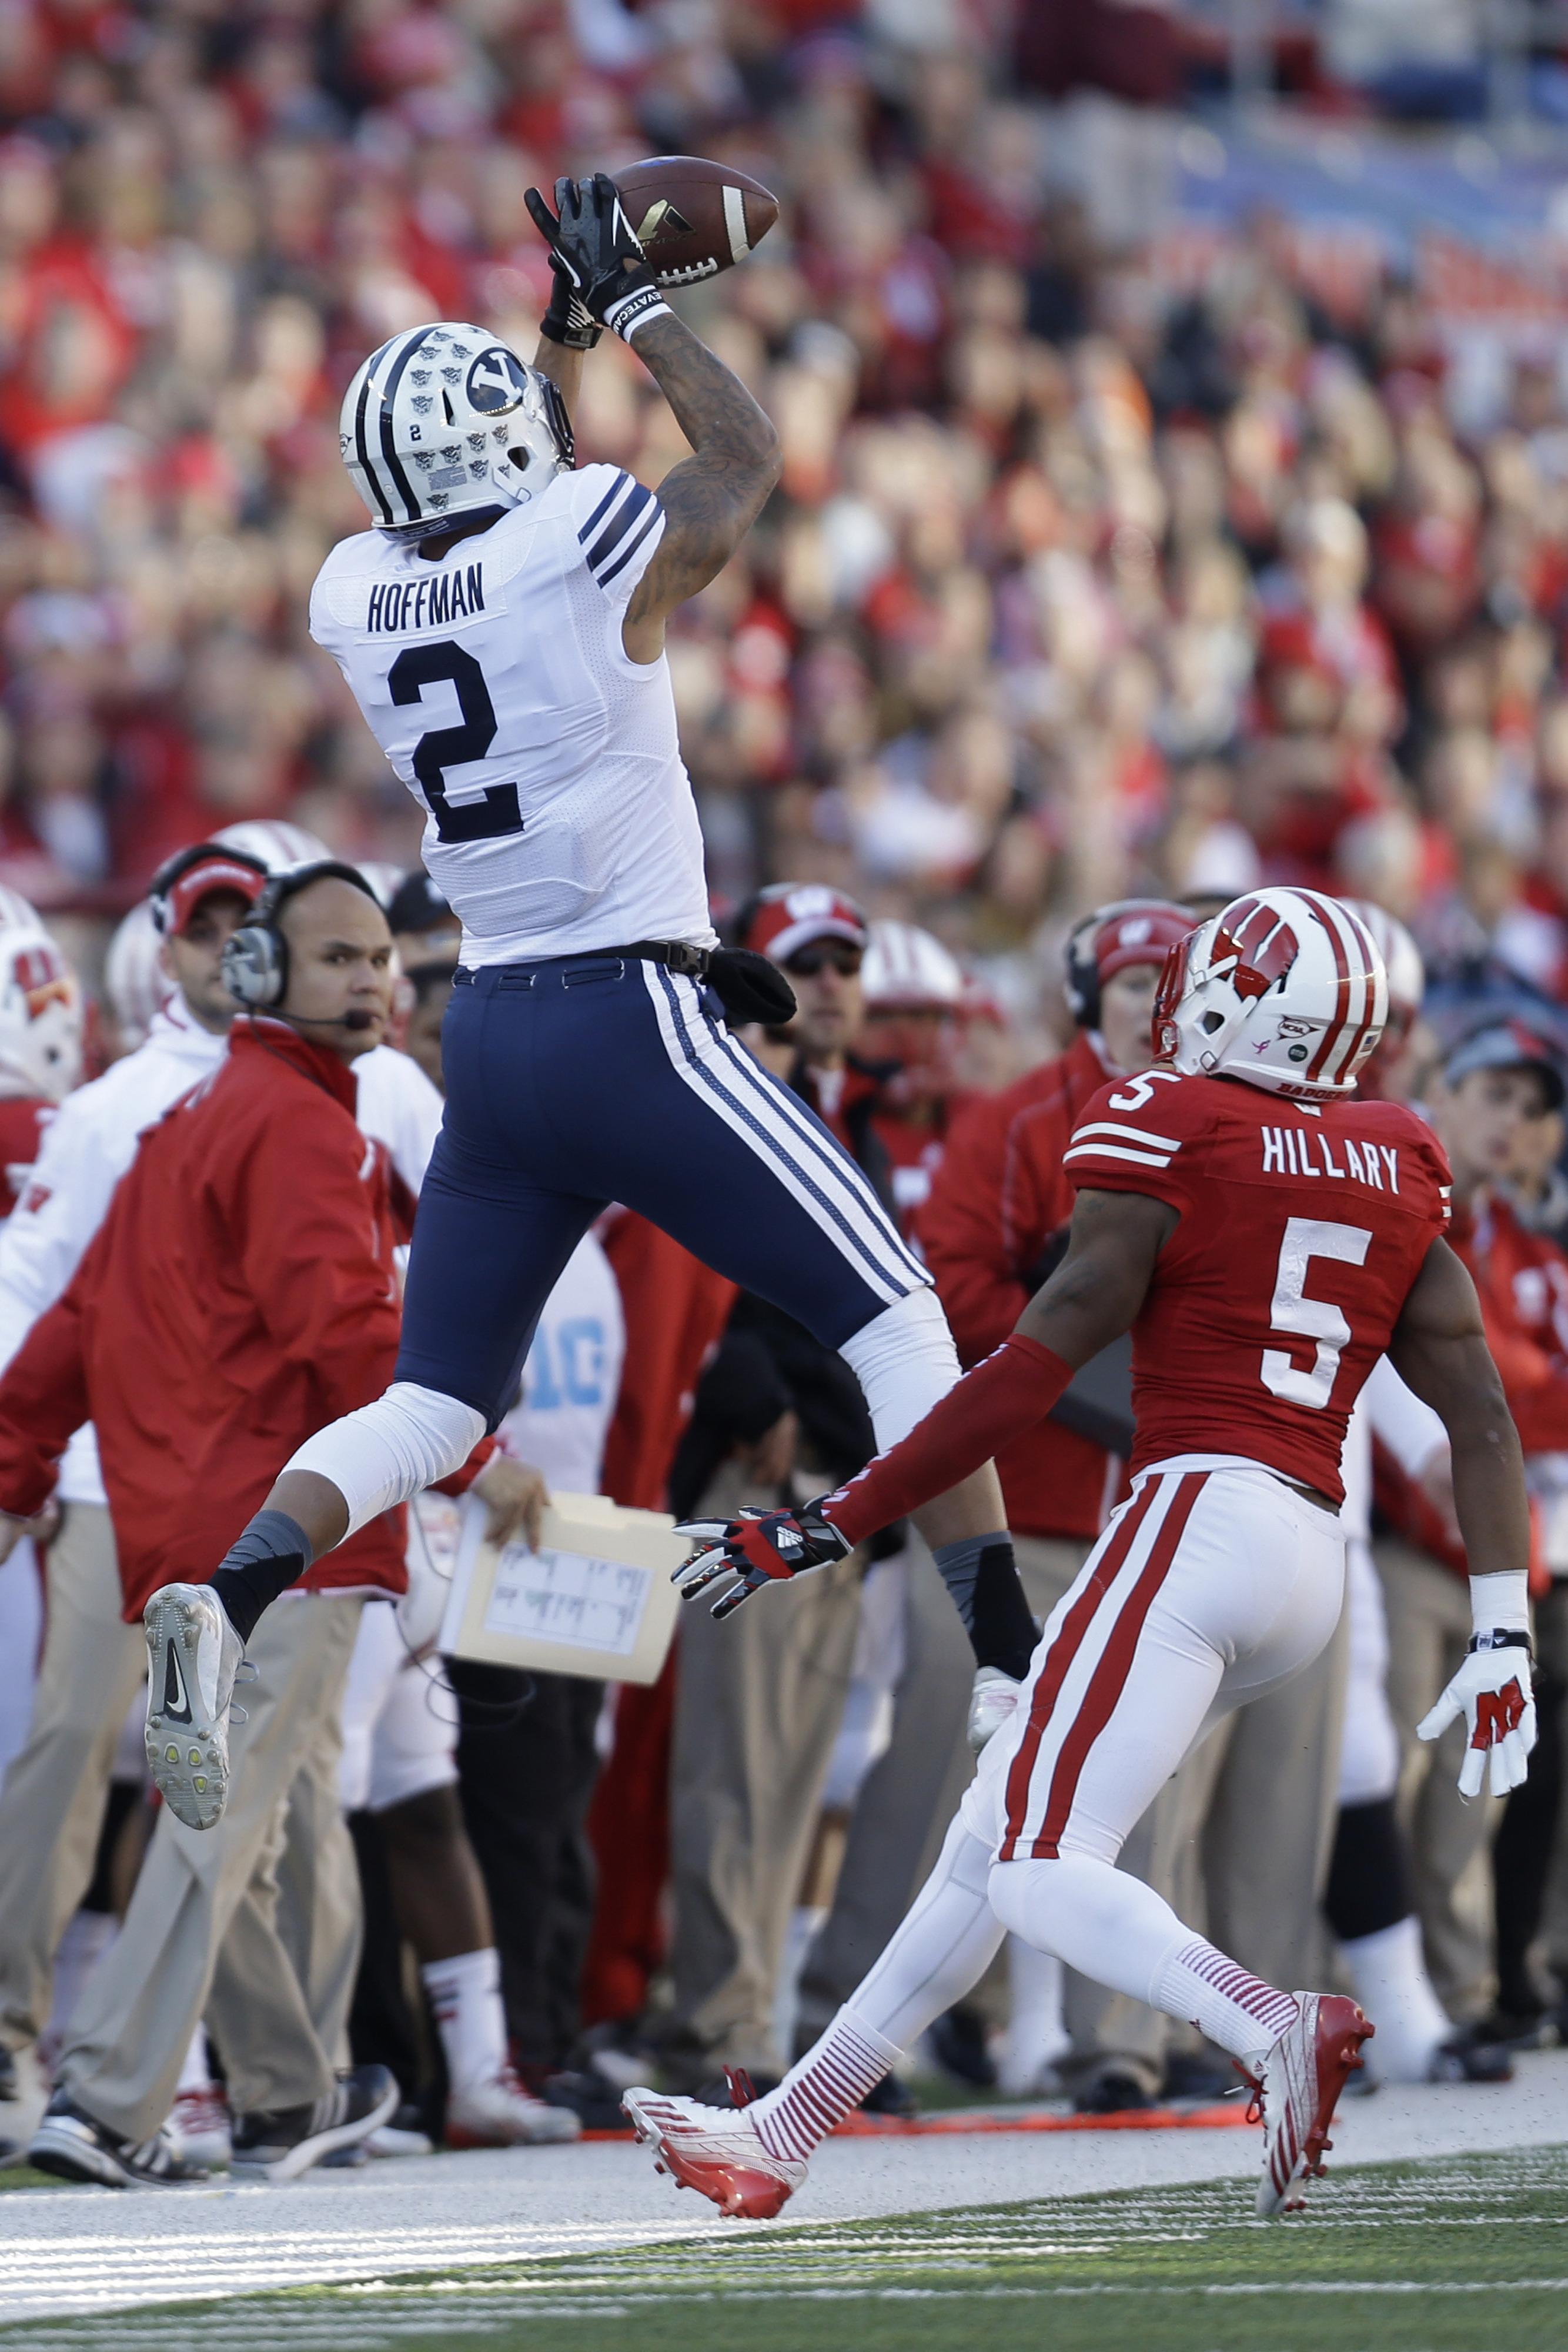 Cody Hoffman elevates against Wisconsin